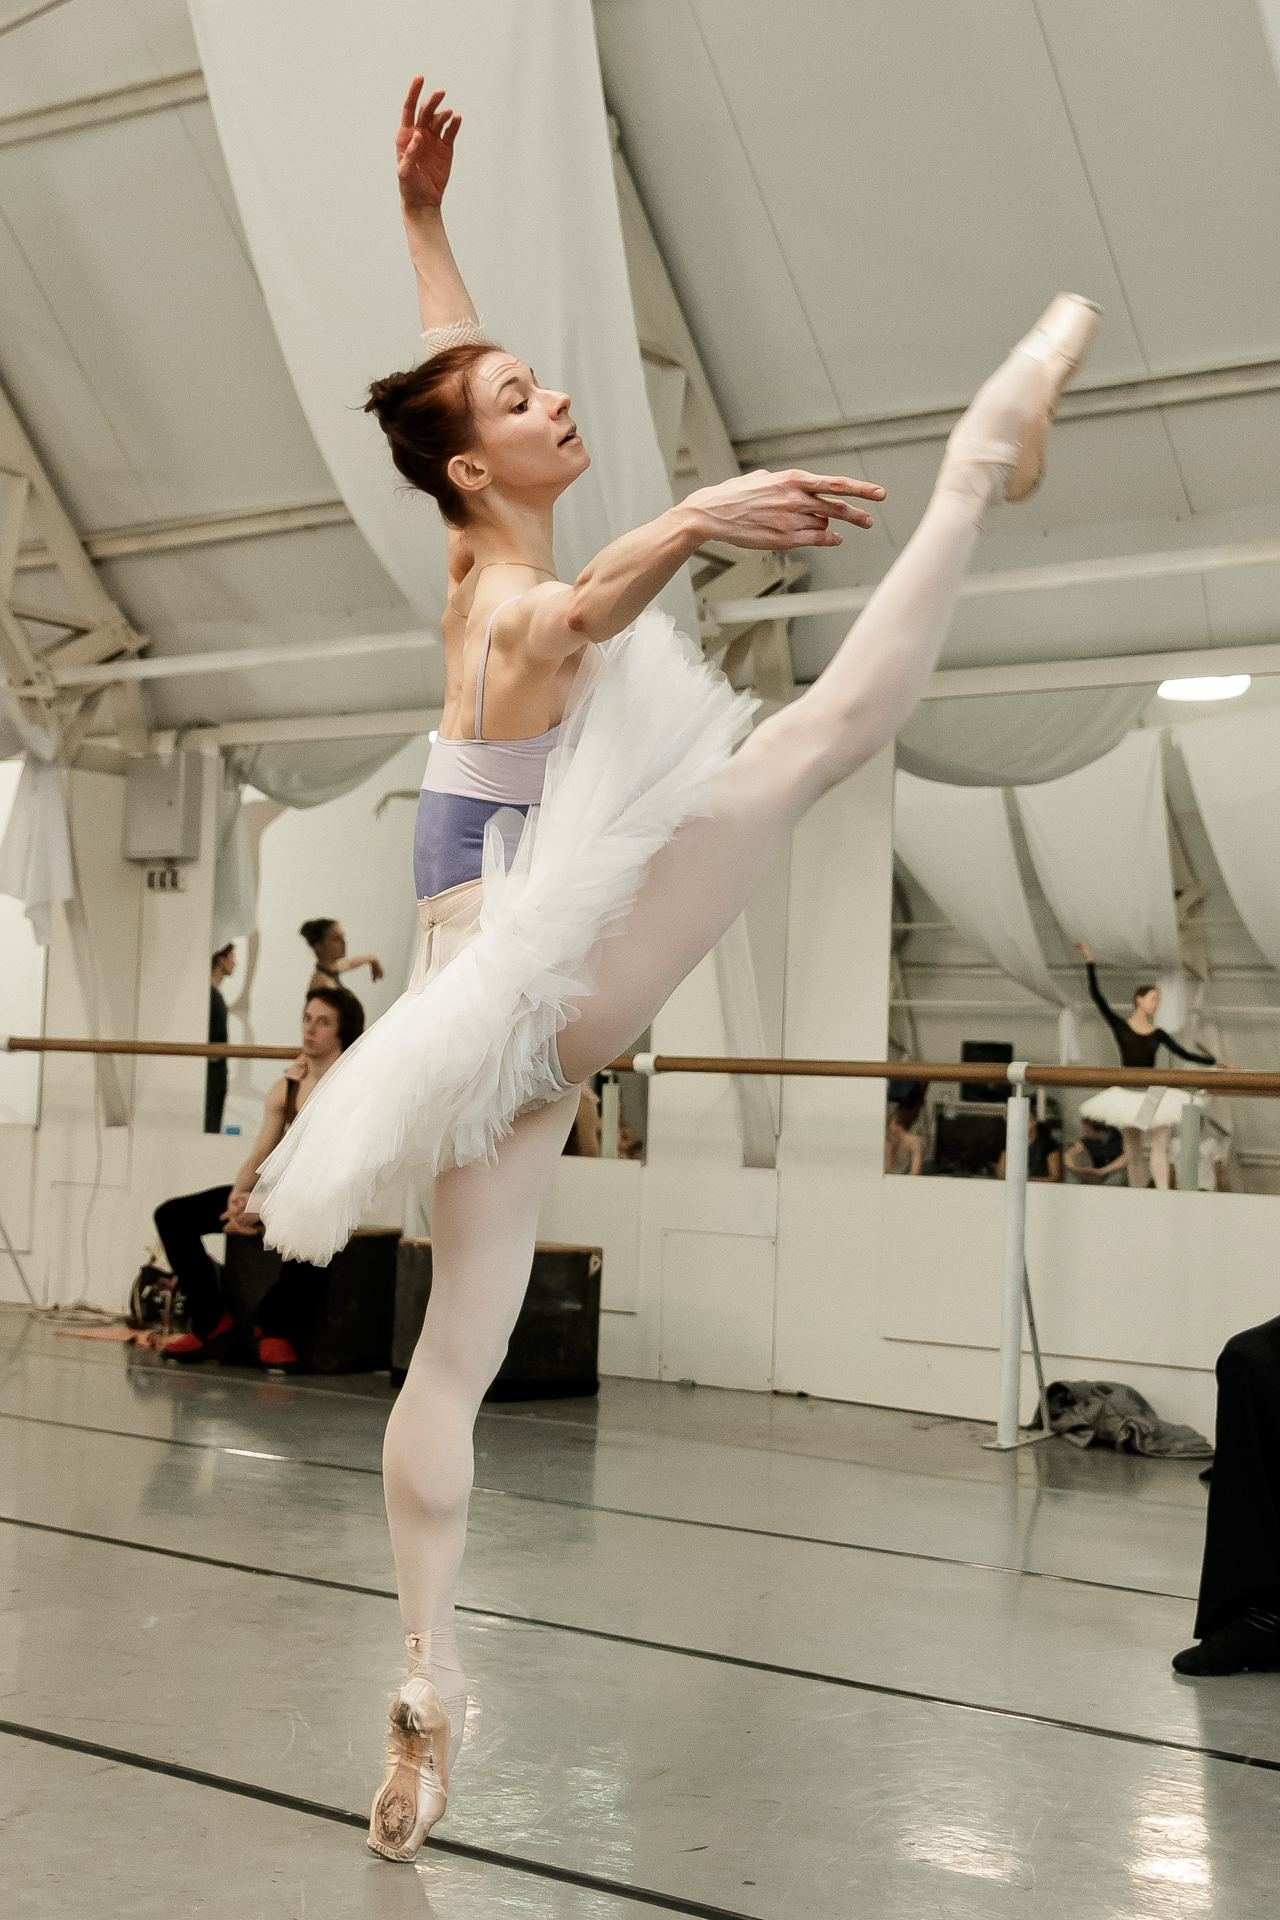 балета в приват фильмах фото